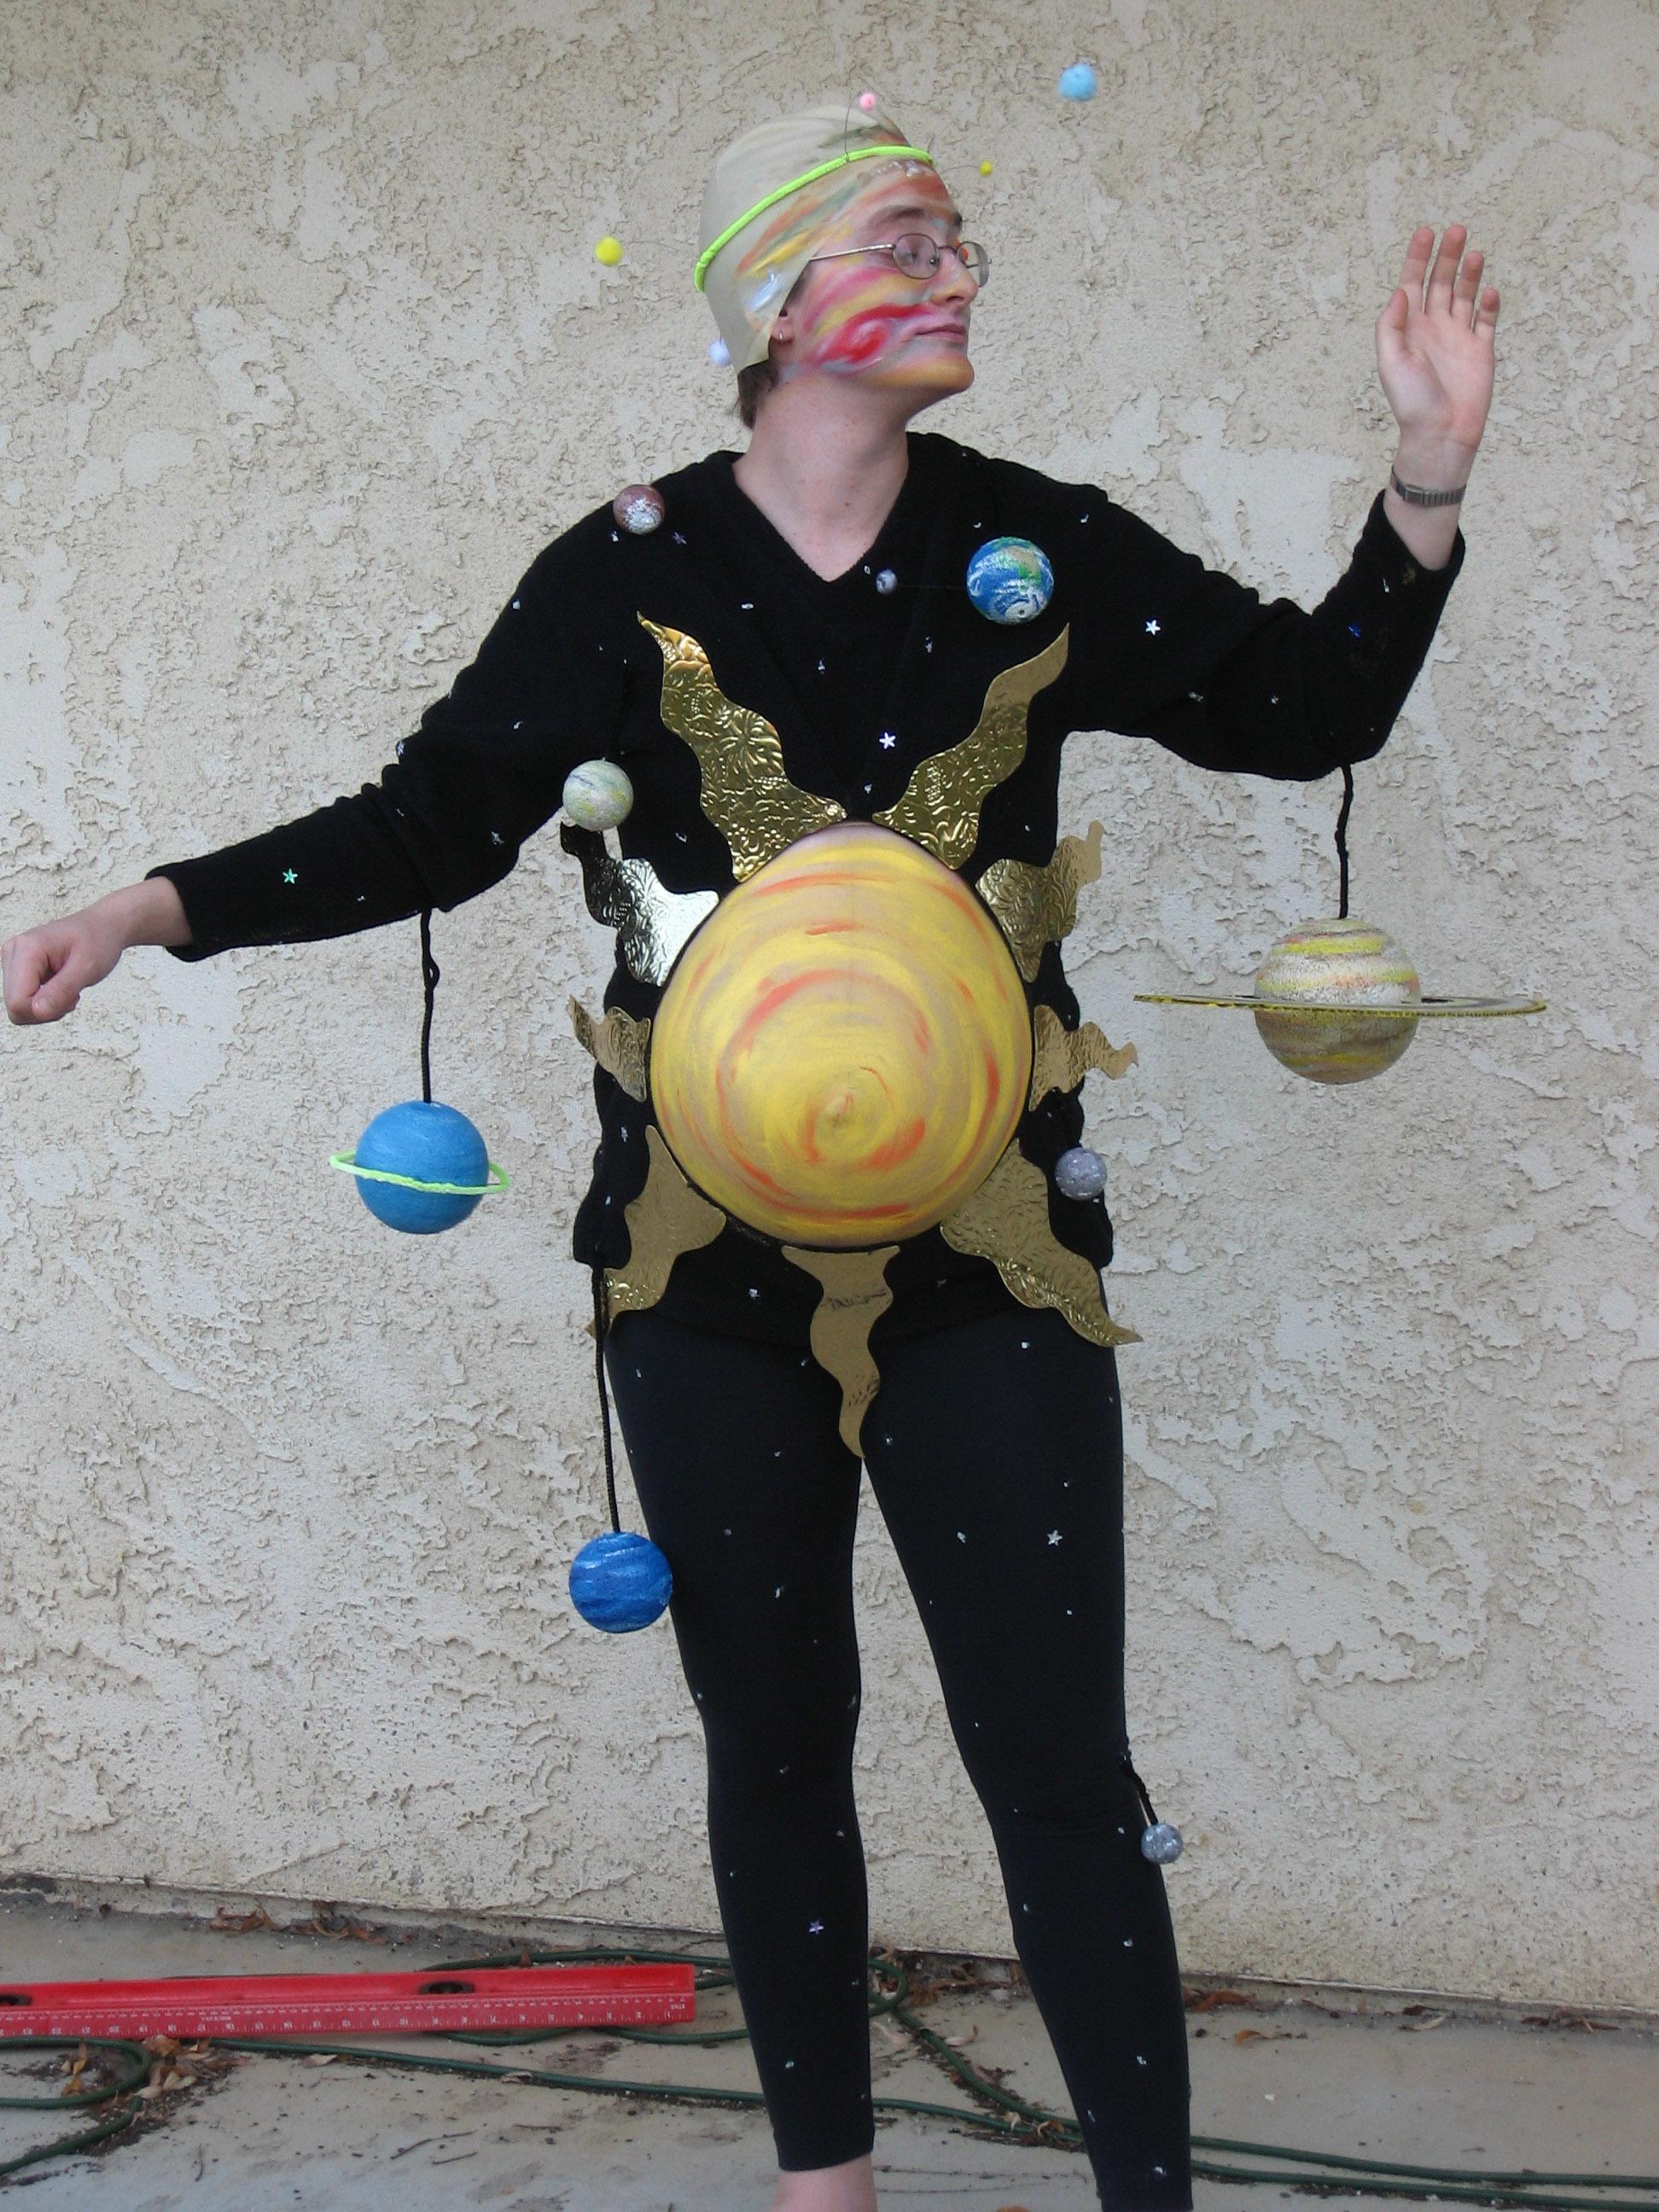 diy solar system dress - photo #13